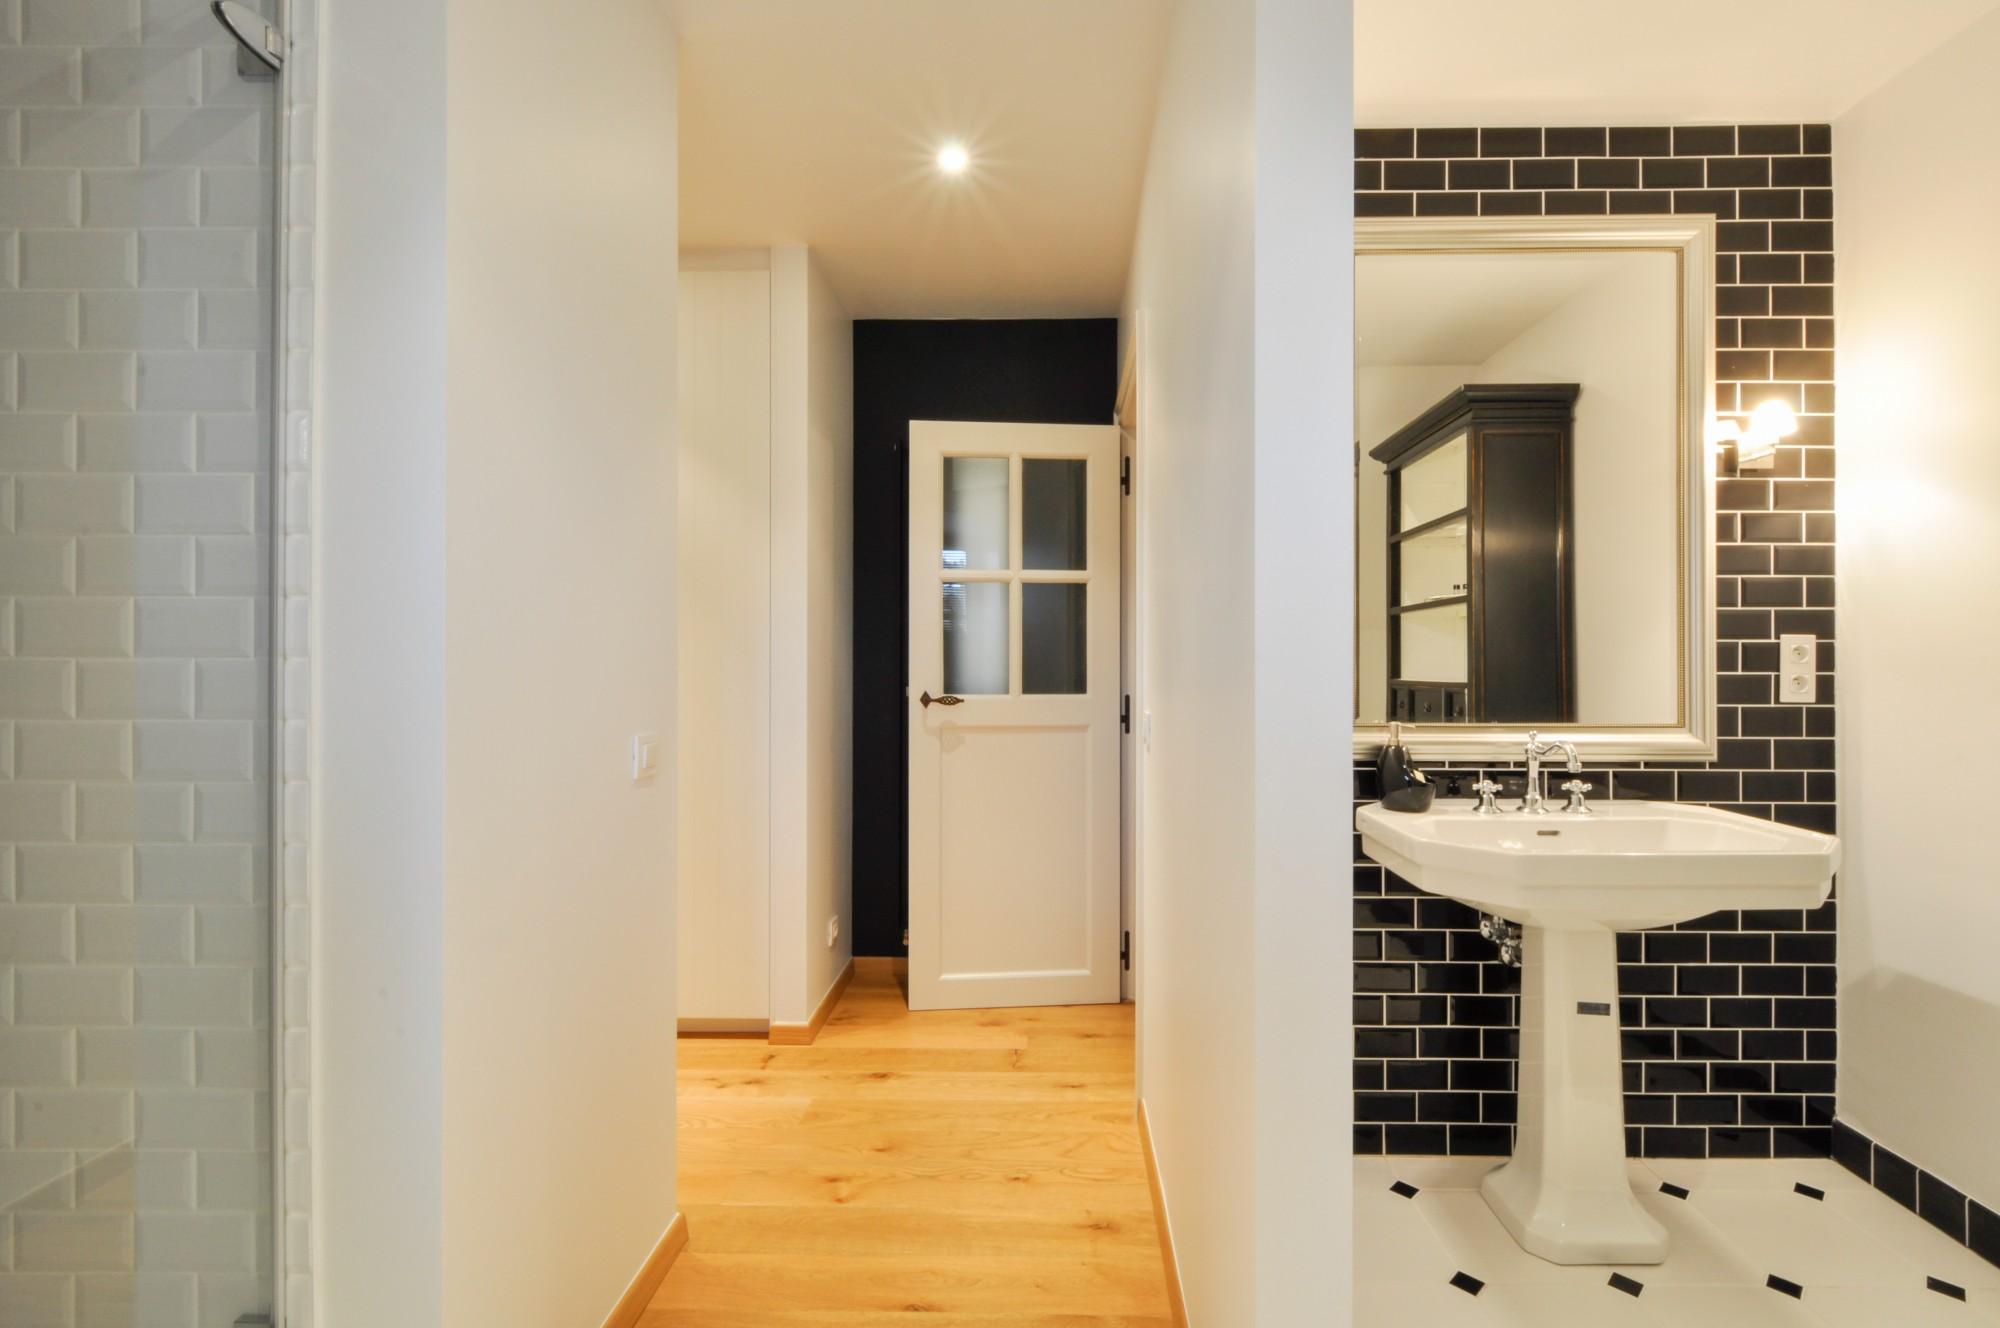 Ventes Appartement T2 F2 Knokke Heist Kasteel Witte Duivenhof